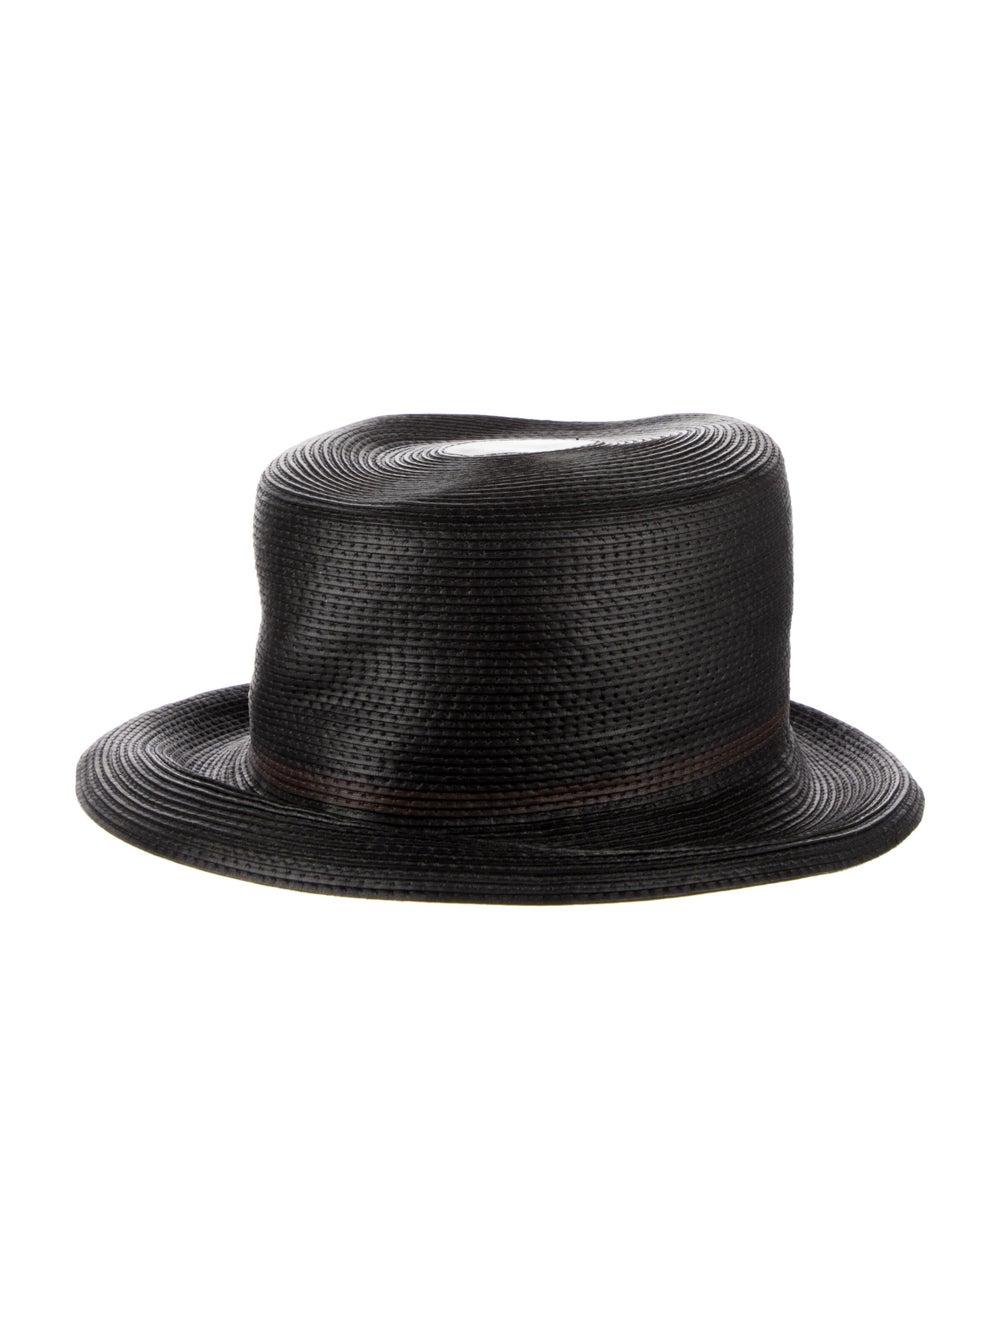 Patricia Underwood Straw Wide Brim Hat Black - image 2